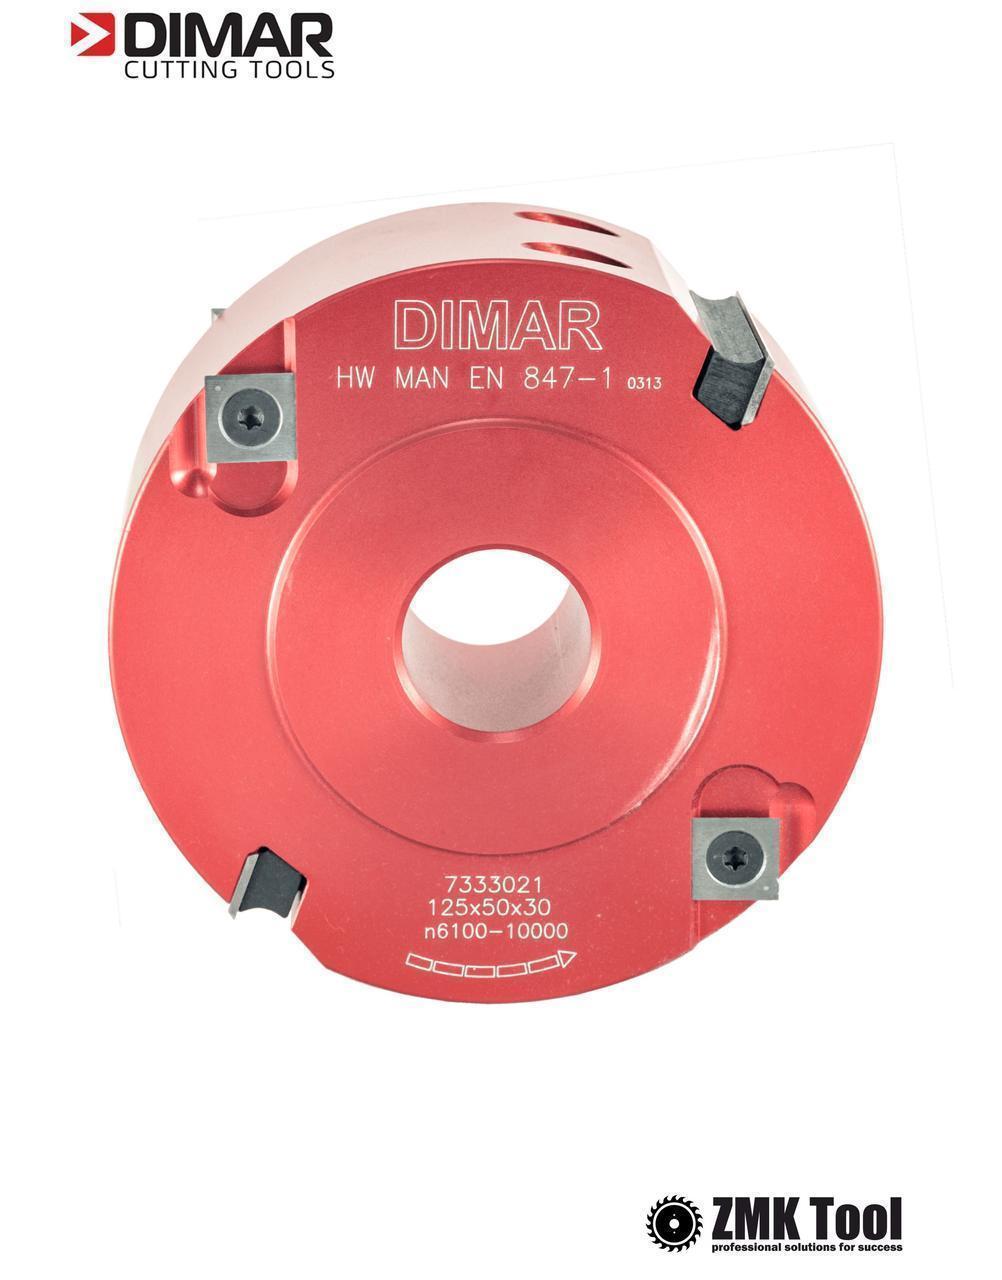 Фреза насадная DIMAR четвертная D=125 d=30 B=50 Z2+4 tmax=30. алюминиевый корпус